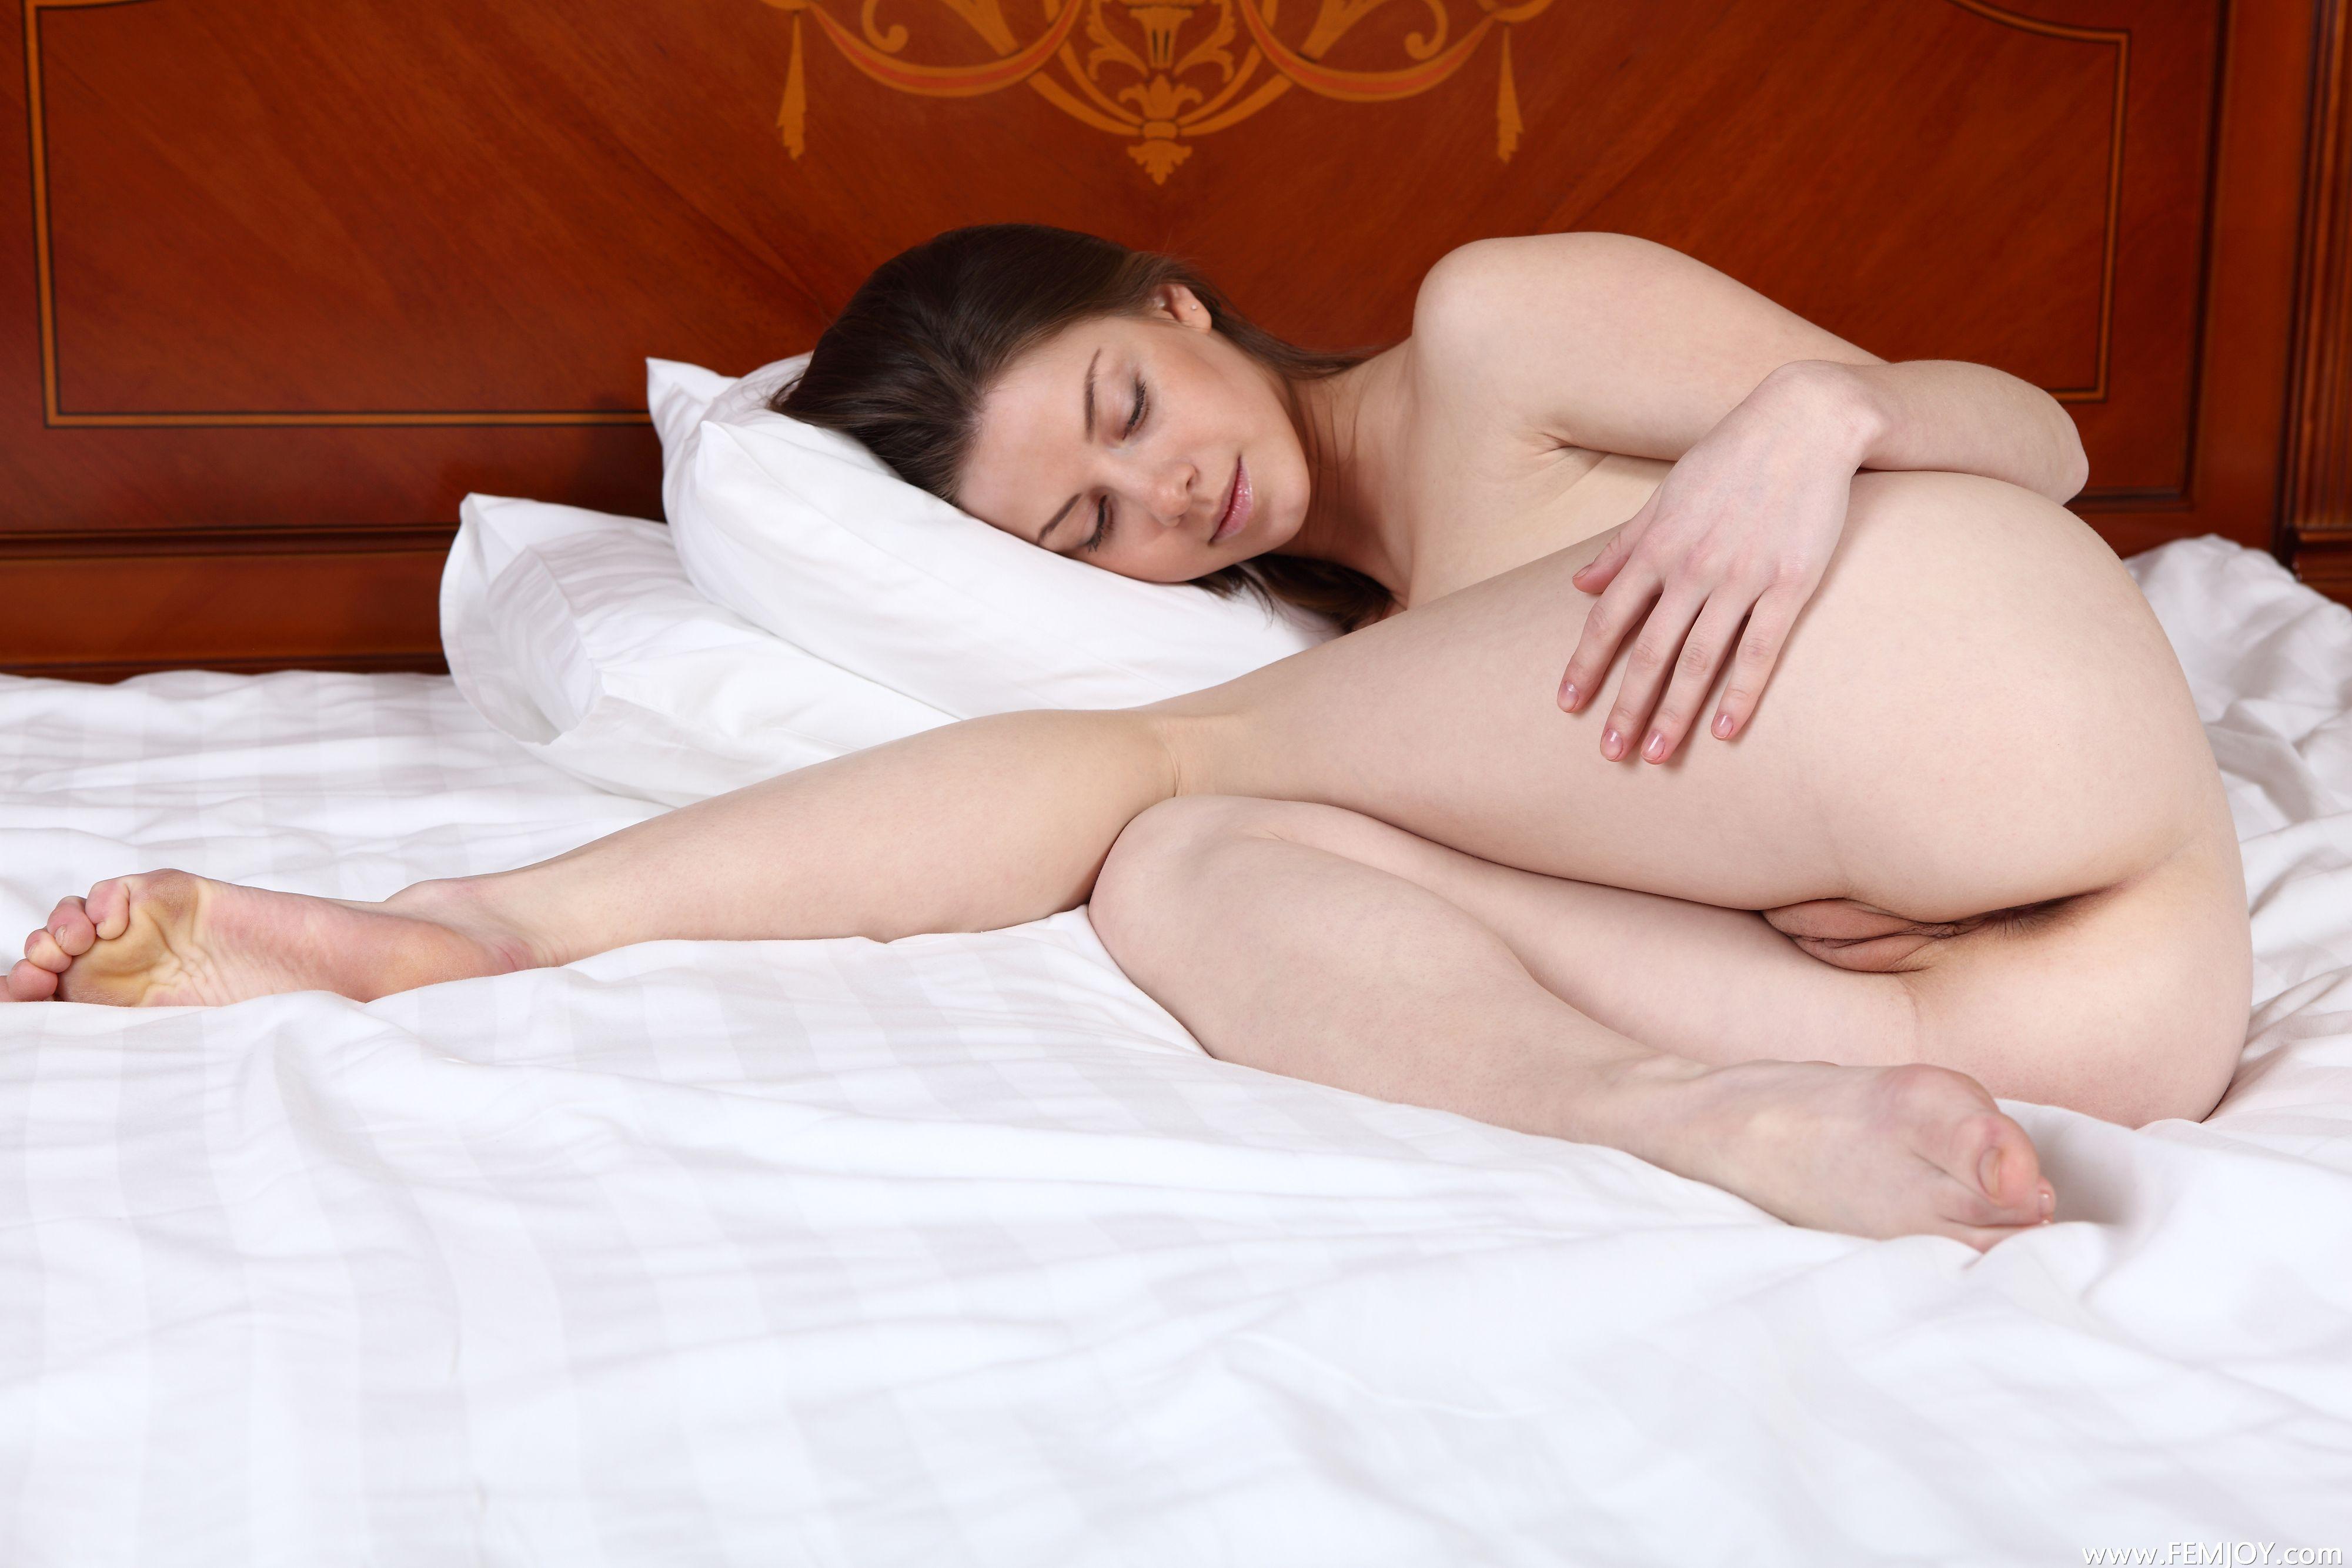 Сестра залезла под одеяло брата сэкс 21 фотография